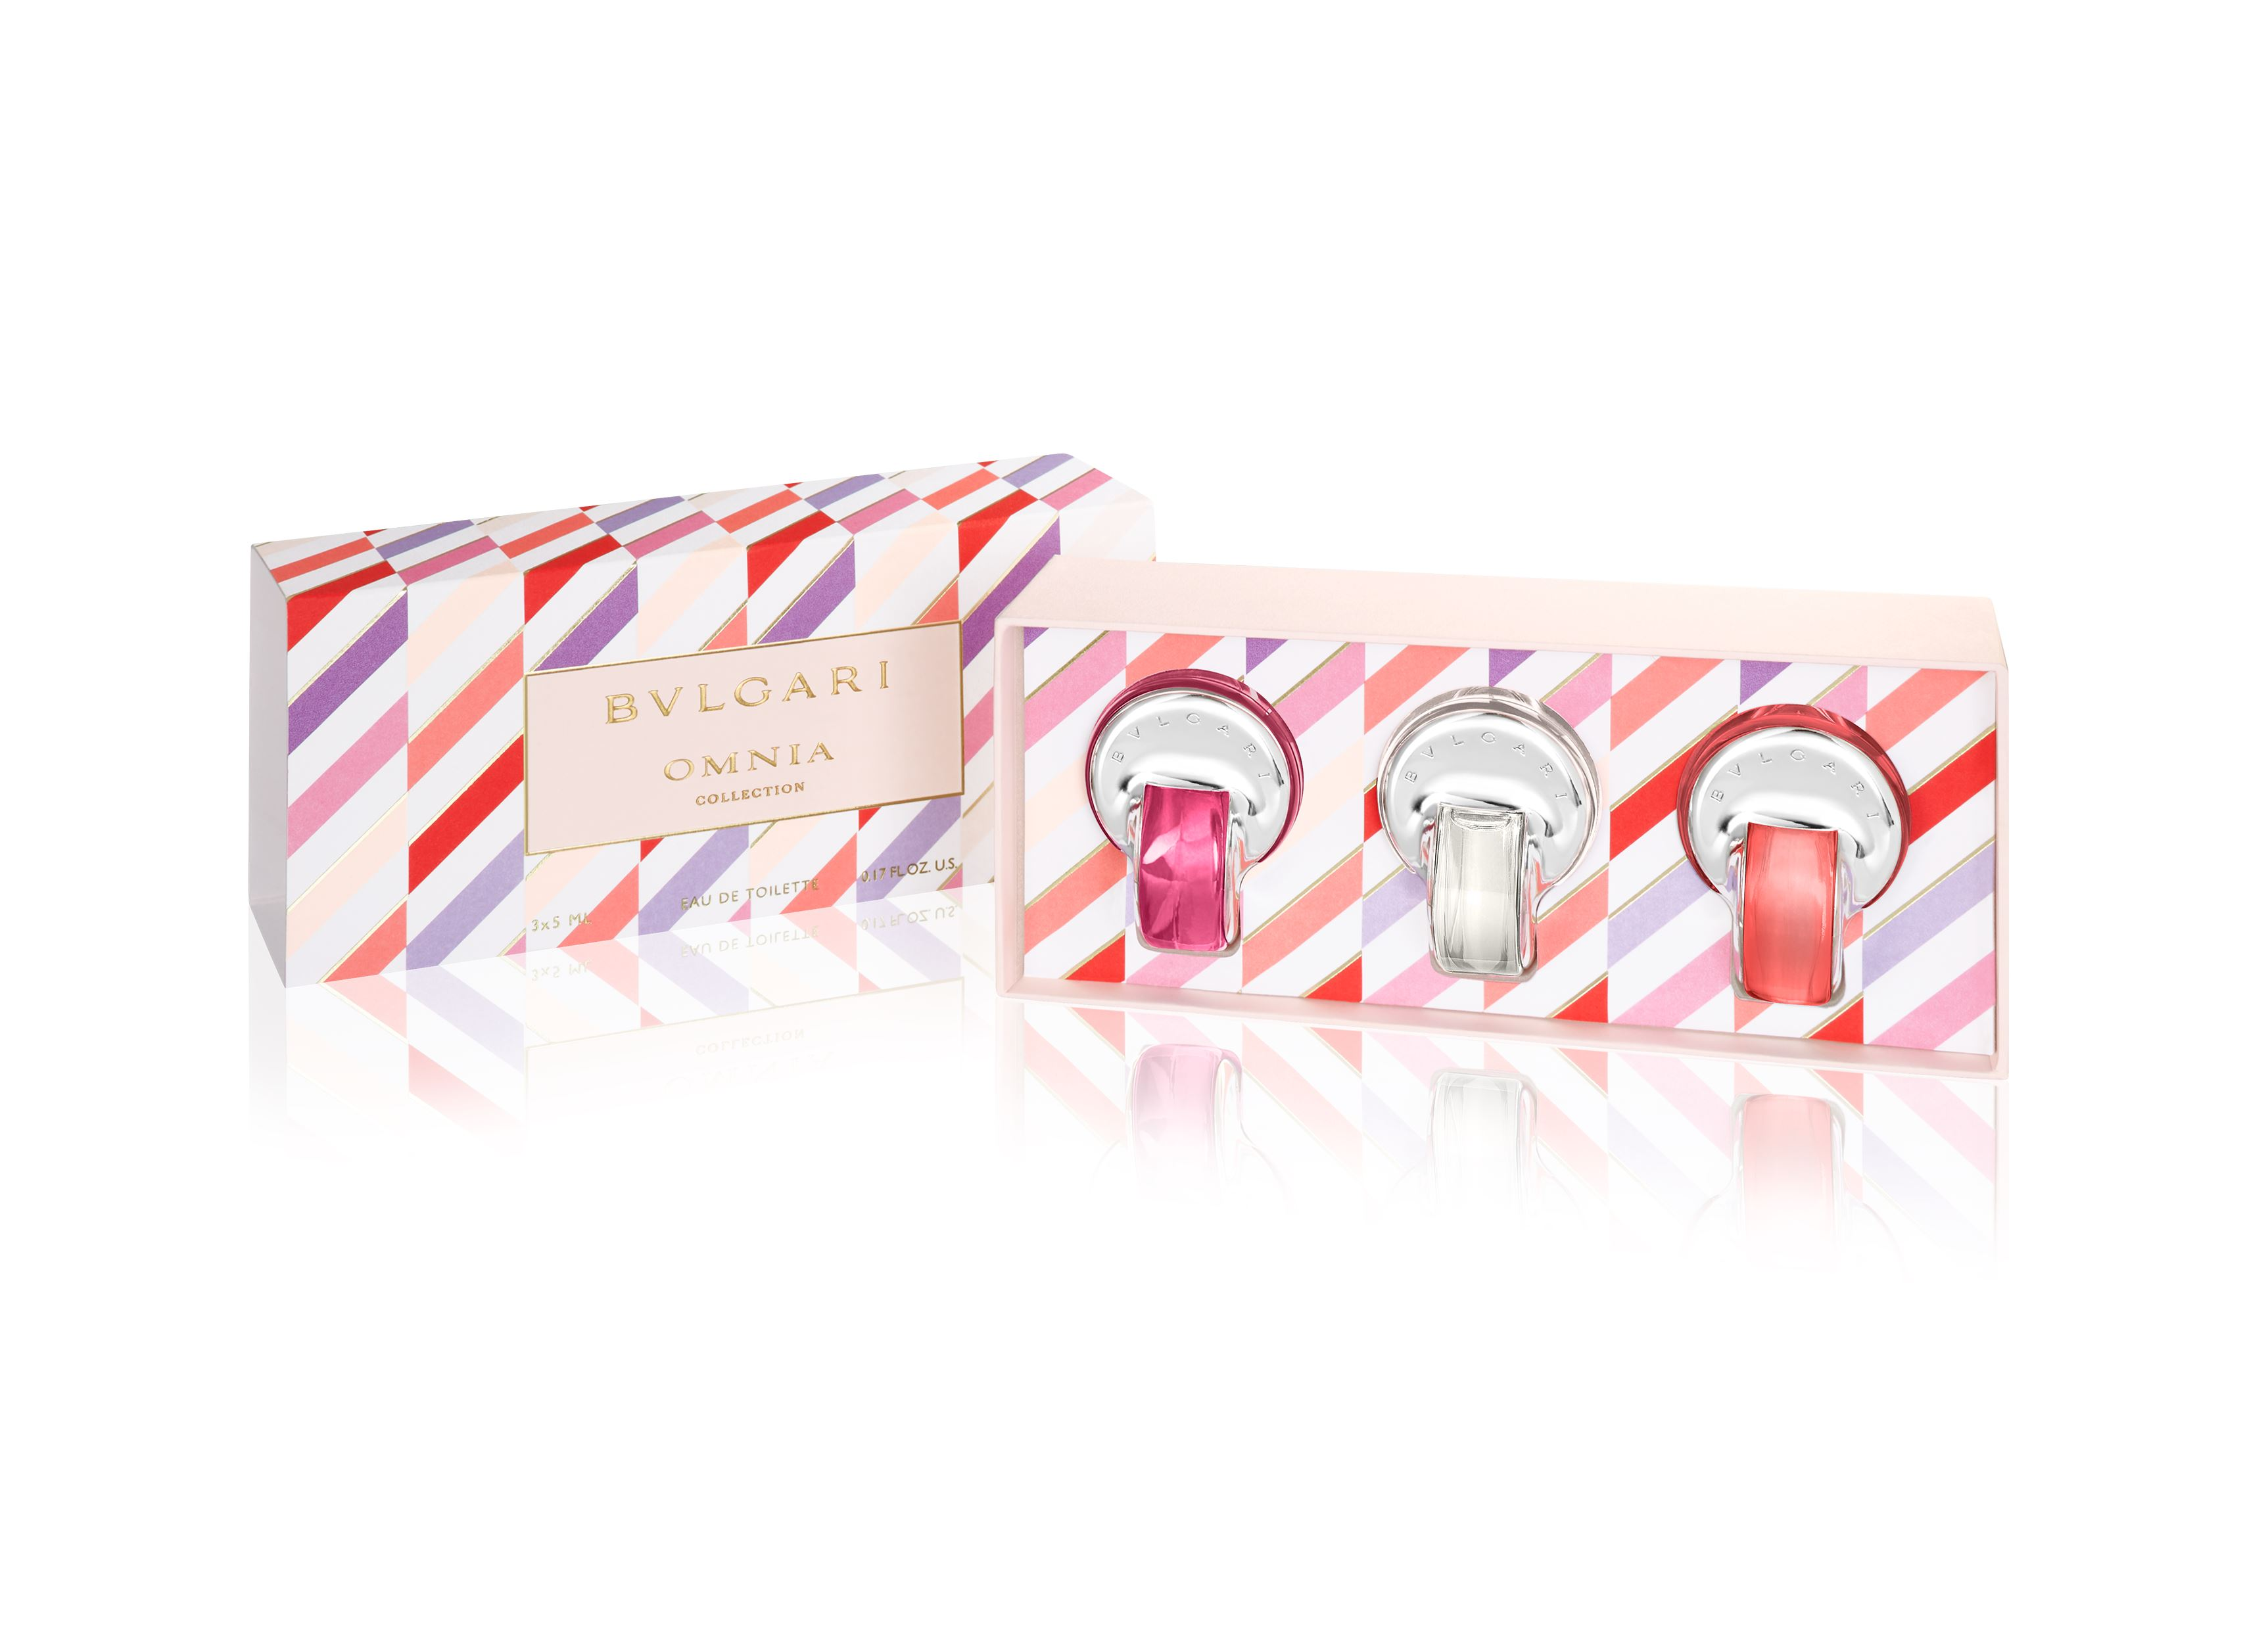 Bvlgari | Omnia Collection Eau de Toilette Kit (Omnia Crystalline and Omnia Pink Sapphire and Omnia Coral)5 MLx3